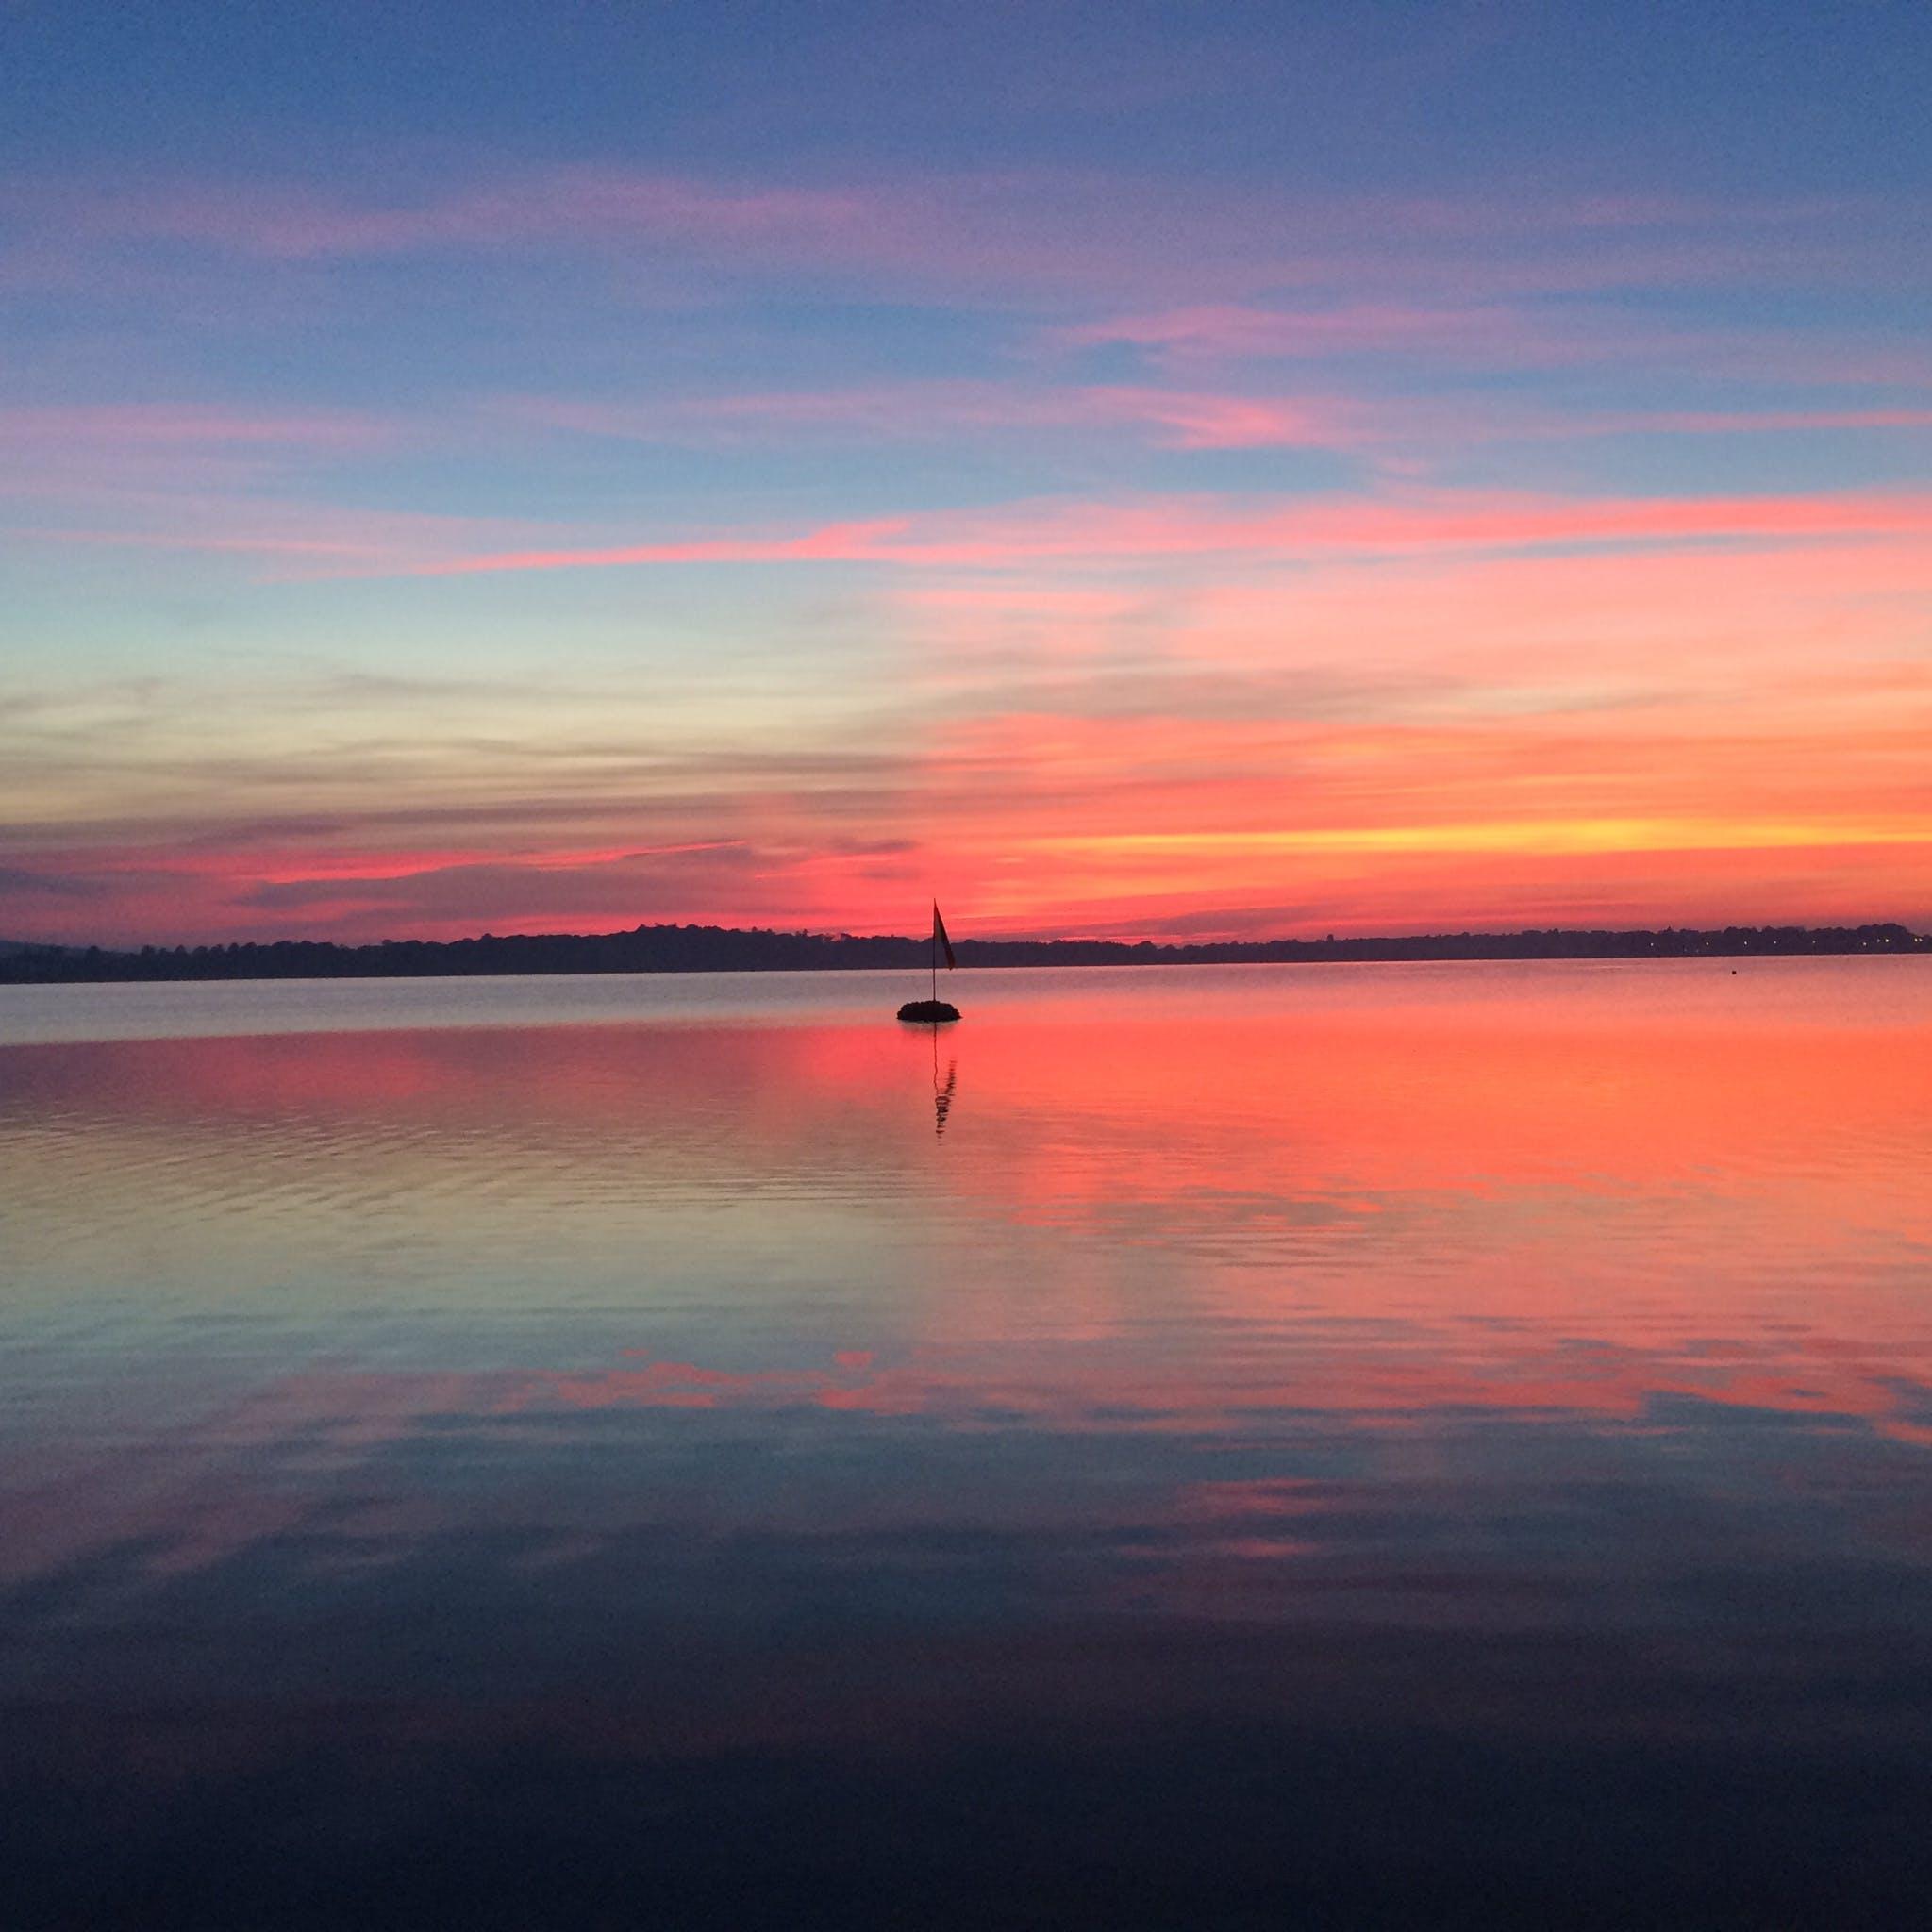 Free stock photo of sunset, lake, ireland, Galway